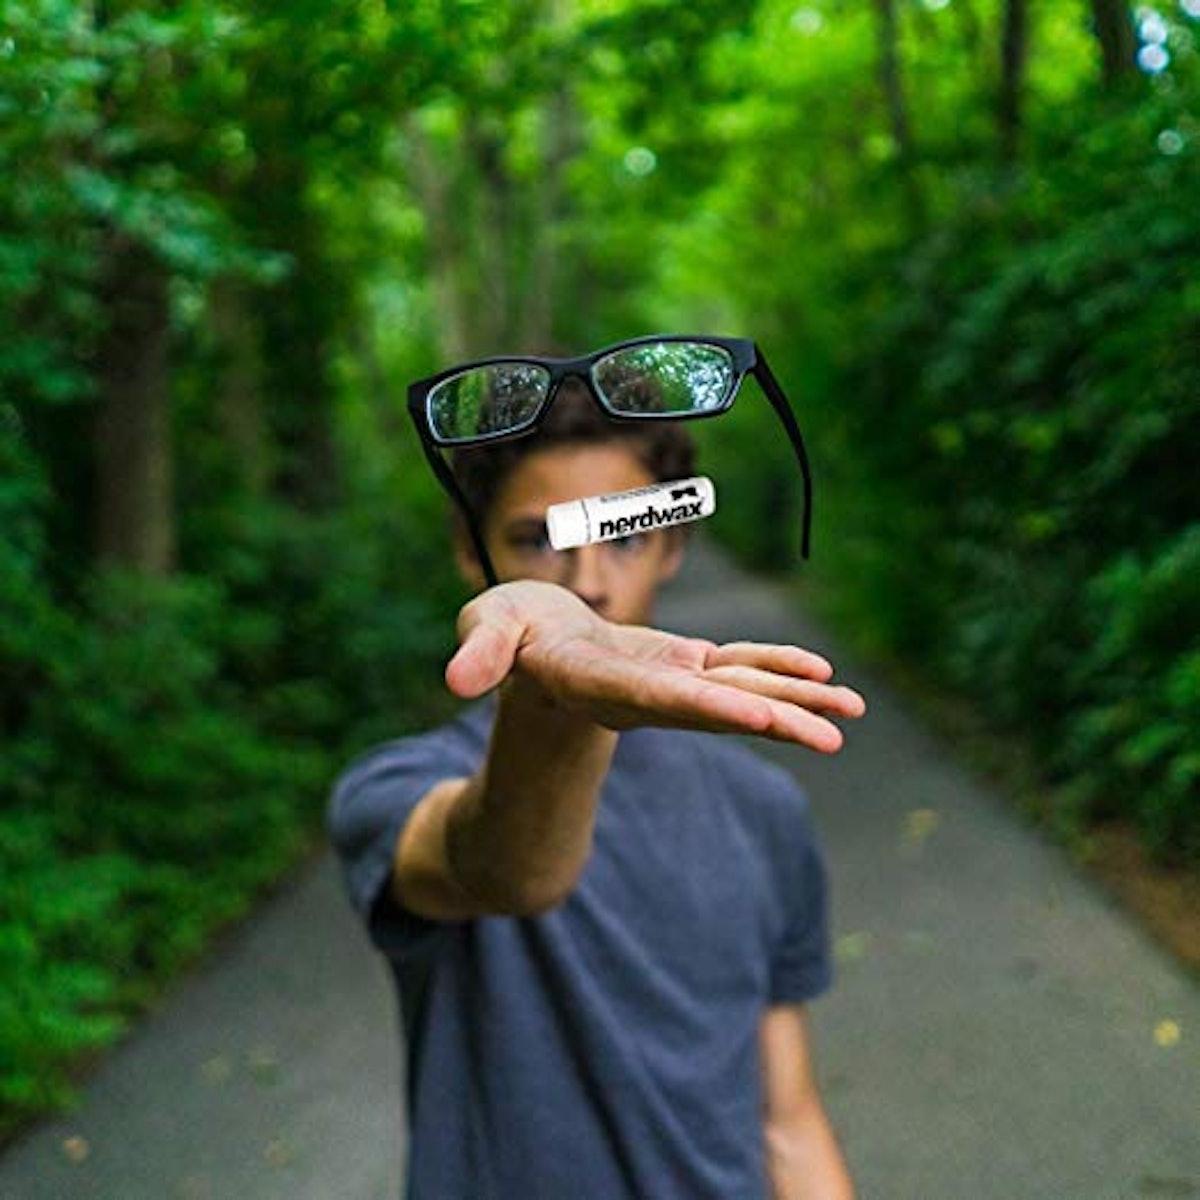 Nerdwax Stop Slipping Glasses